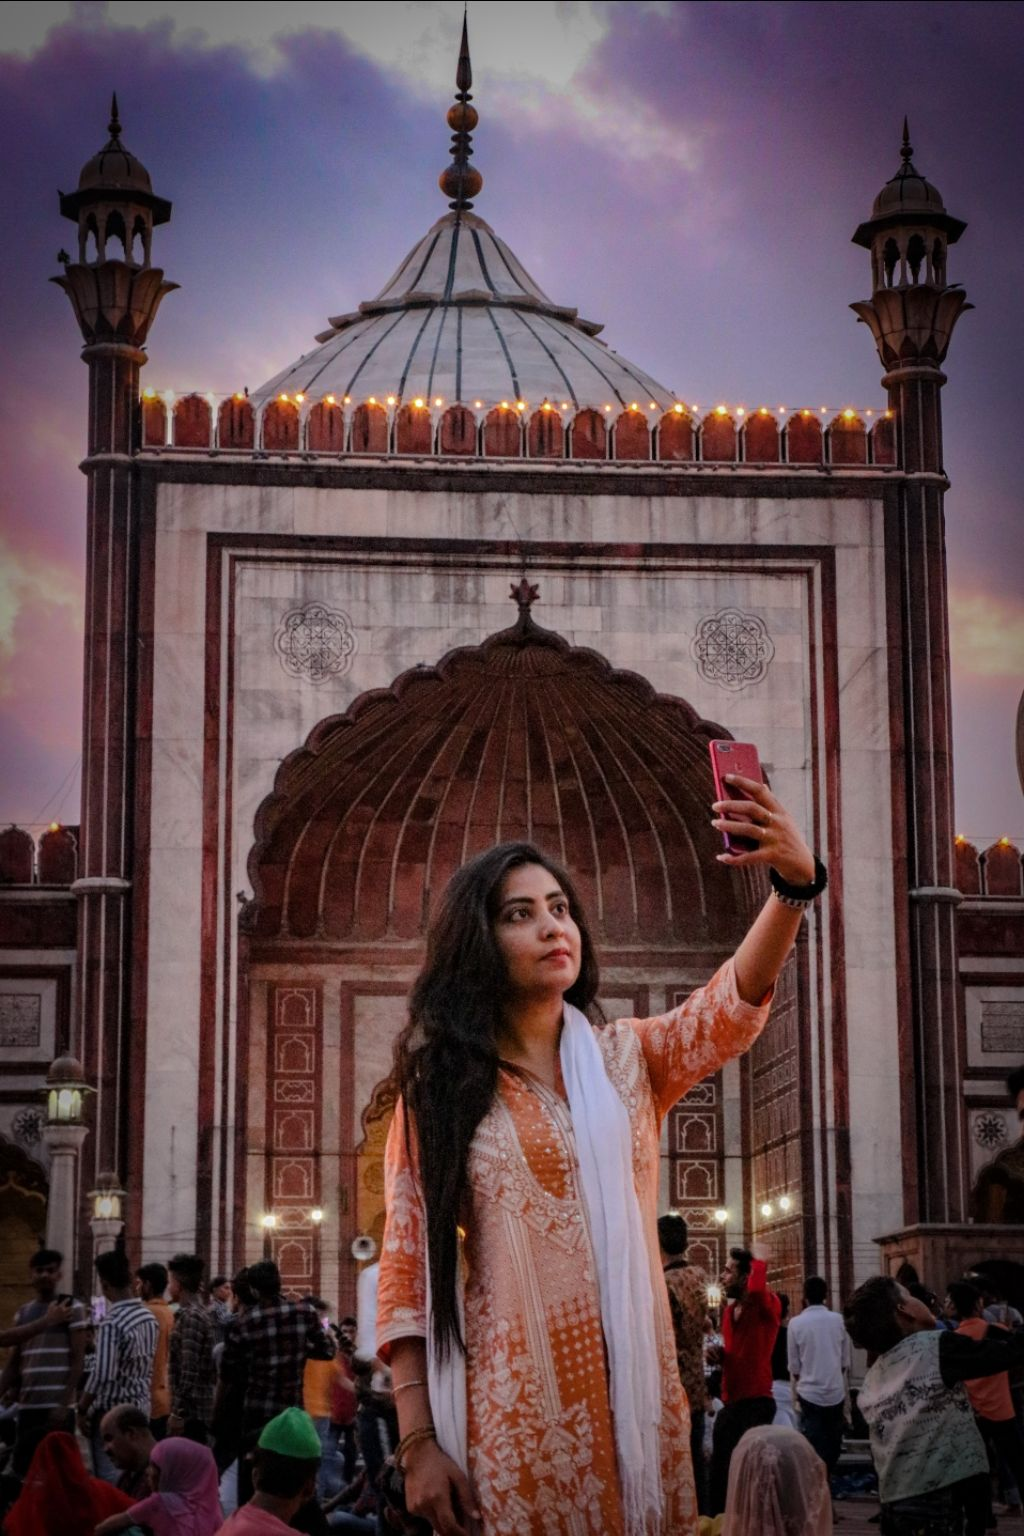 Photo of Jama Masjid By Nayak D Prem